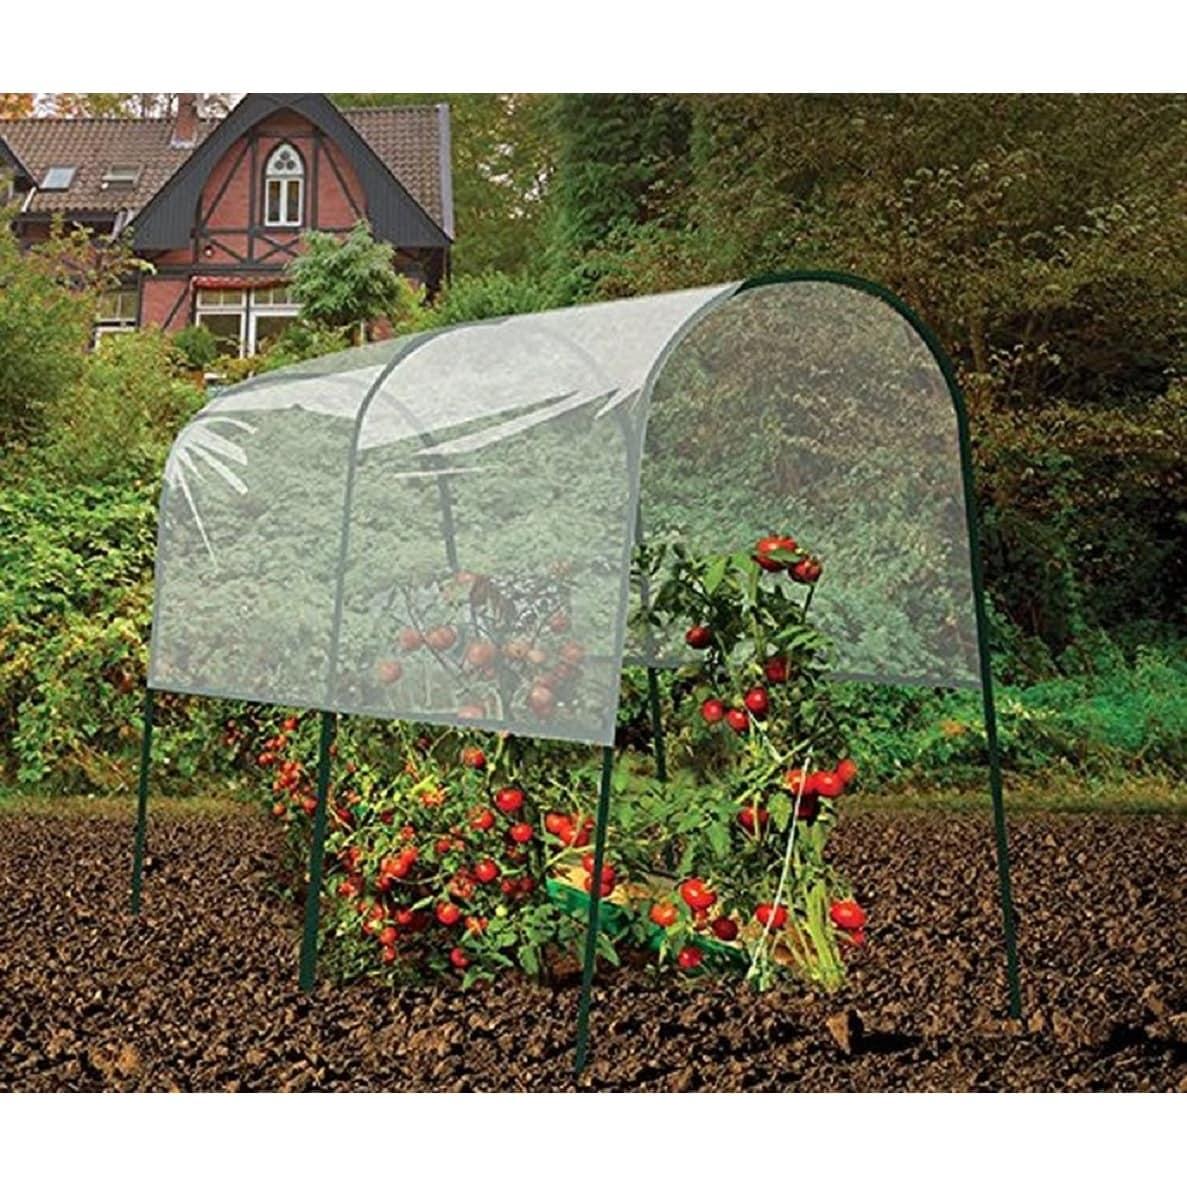 USA Gardman Tomato (Red) Greenhouse (Iron) #7623, Gardening